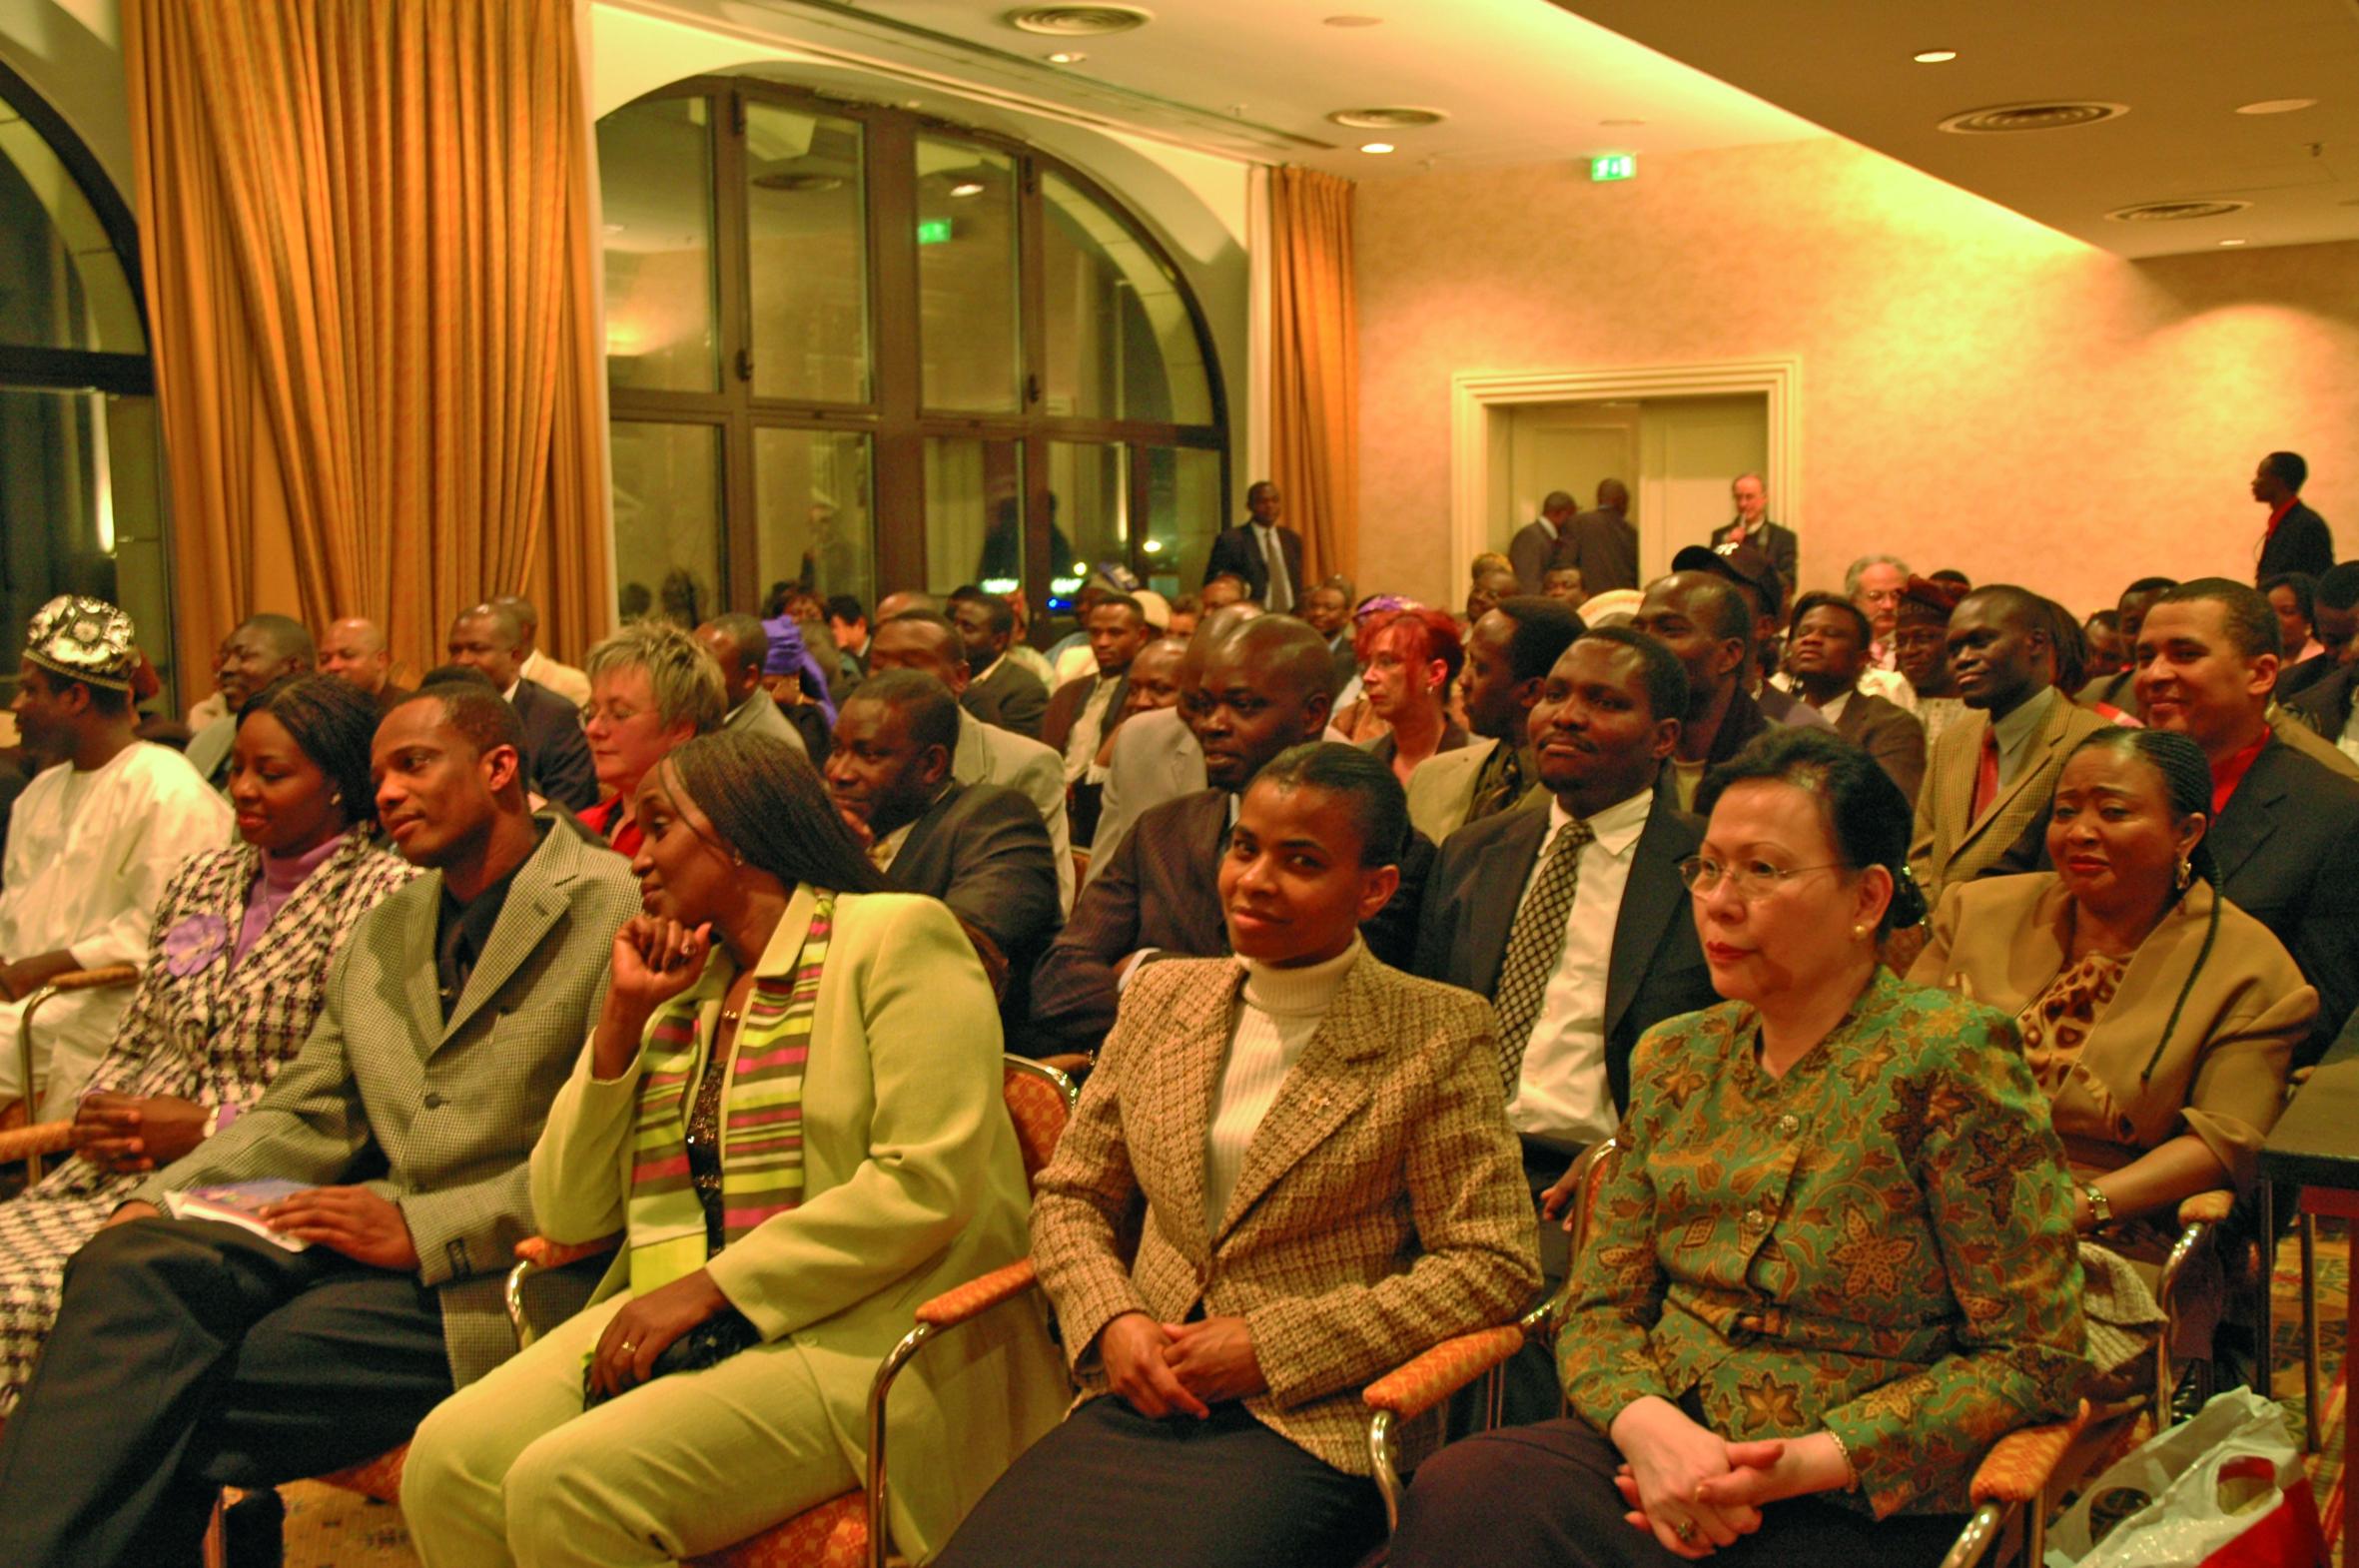 270 Nigerian experts in diaspora seek opportunities at SNEPCo summit